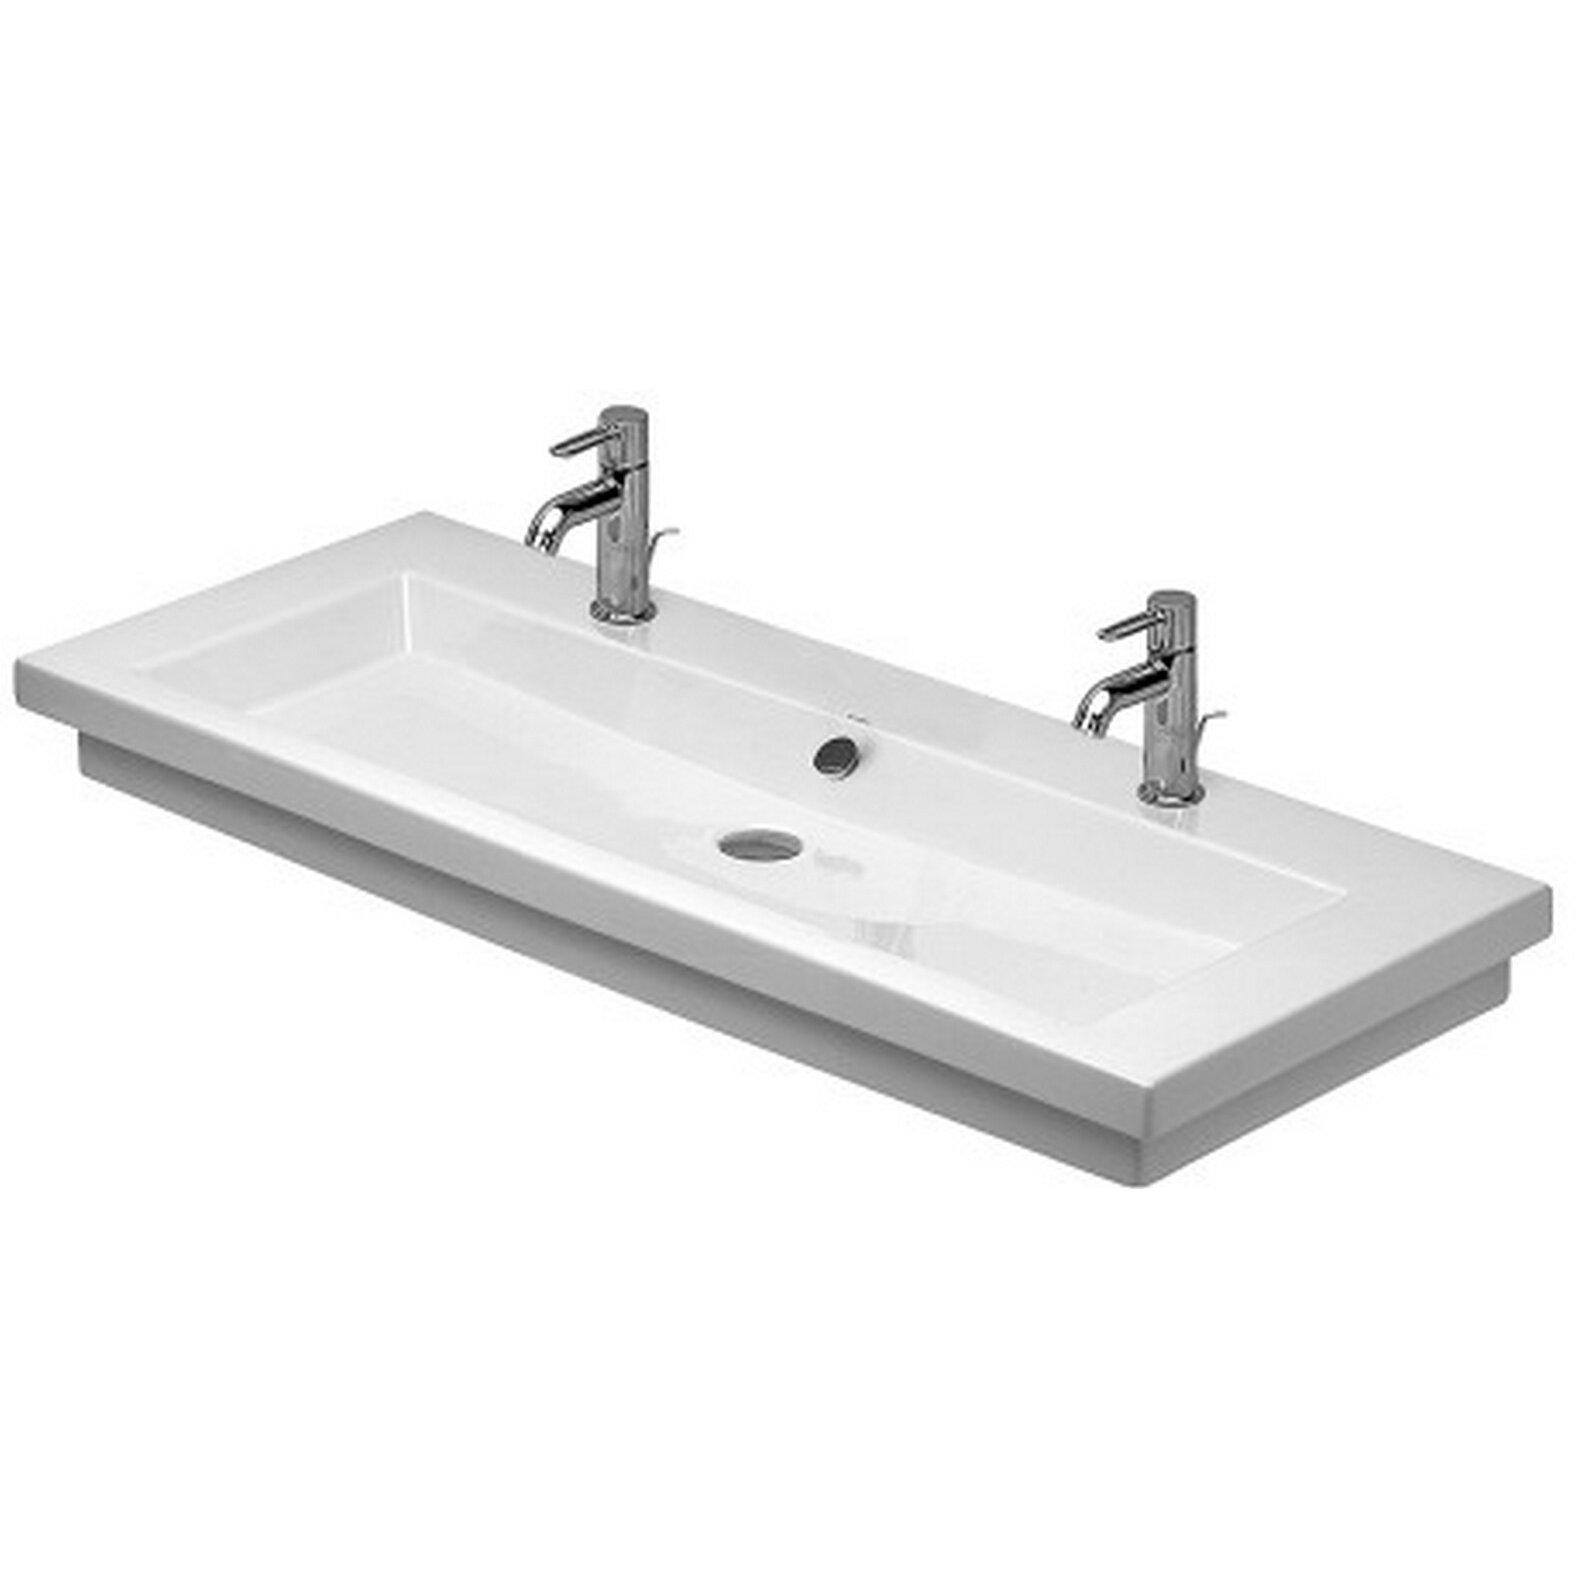 2nd floor bathroom sink with overflow wayfair. Black Bedroom Furniture Sets. Home Design Ideas